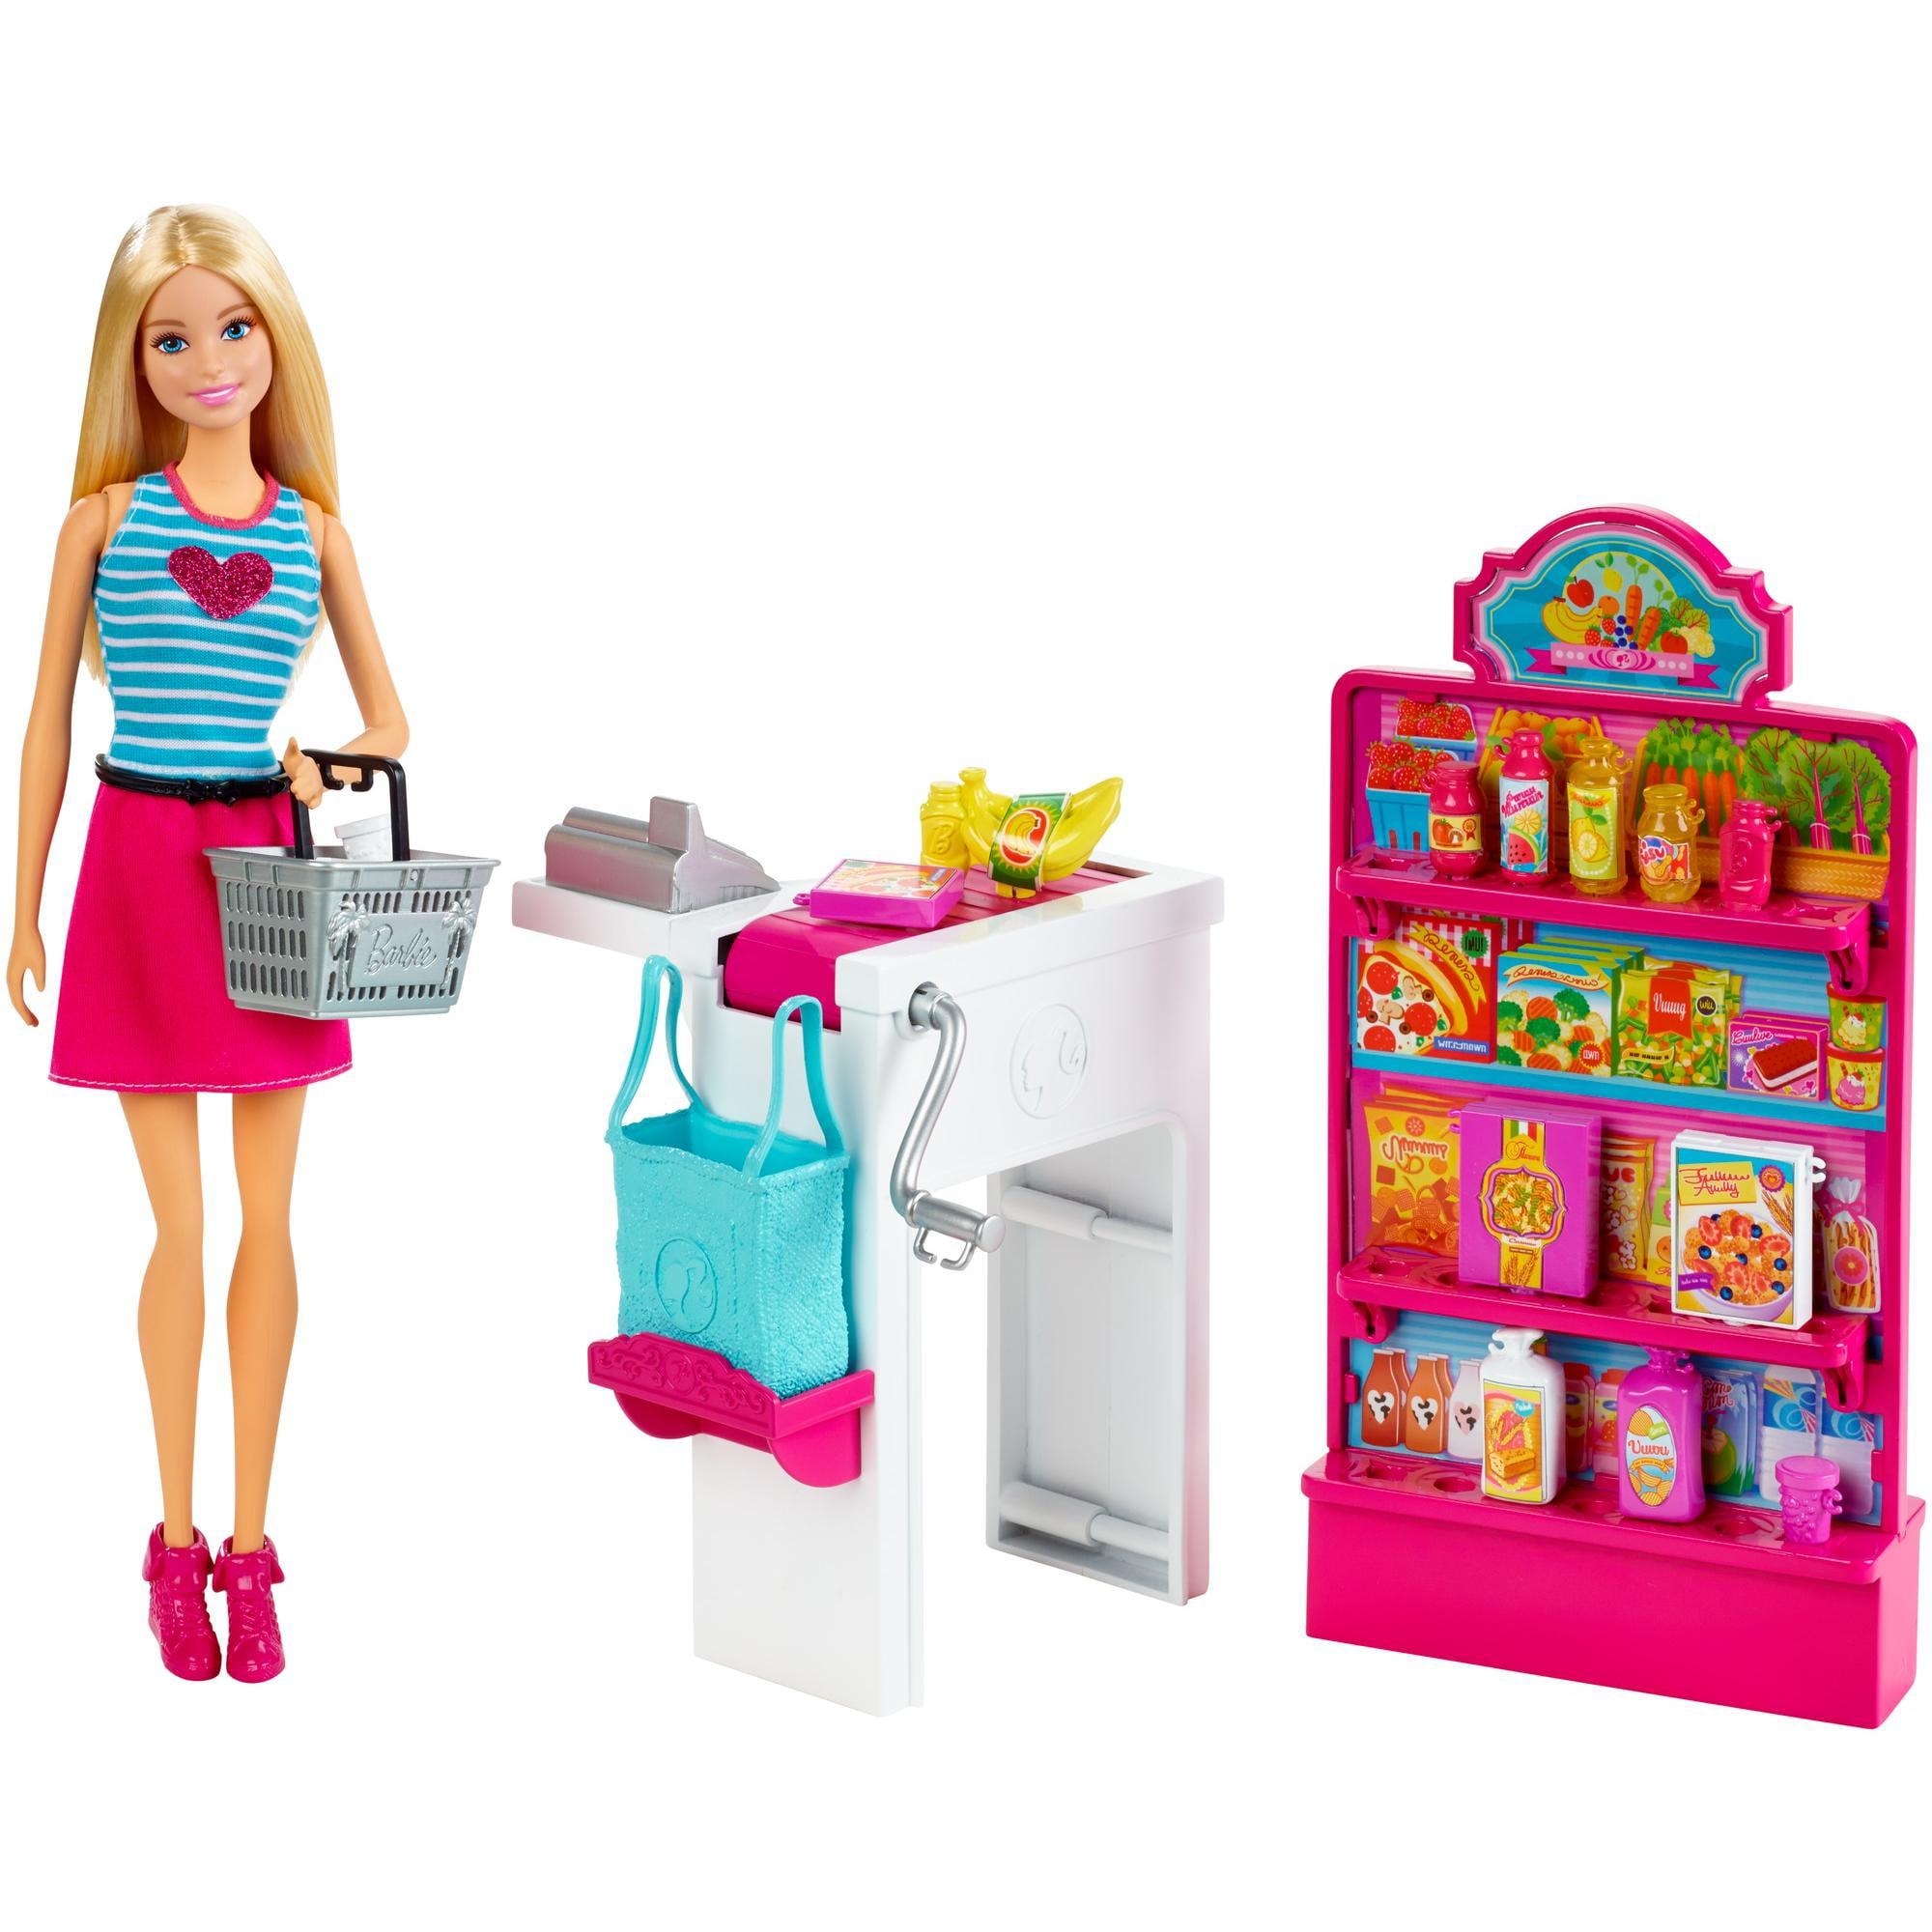 Barbie Malibu Ave Market with Doll Playset